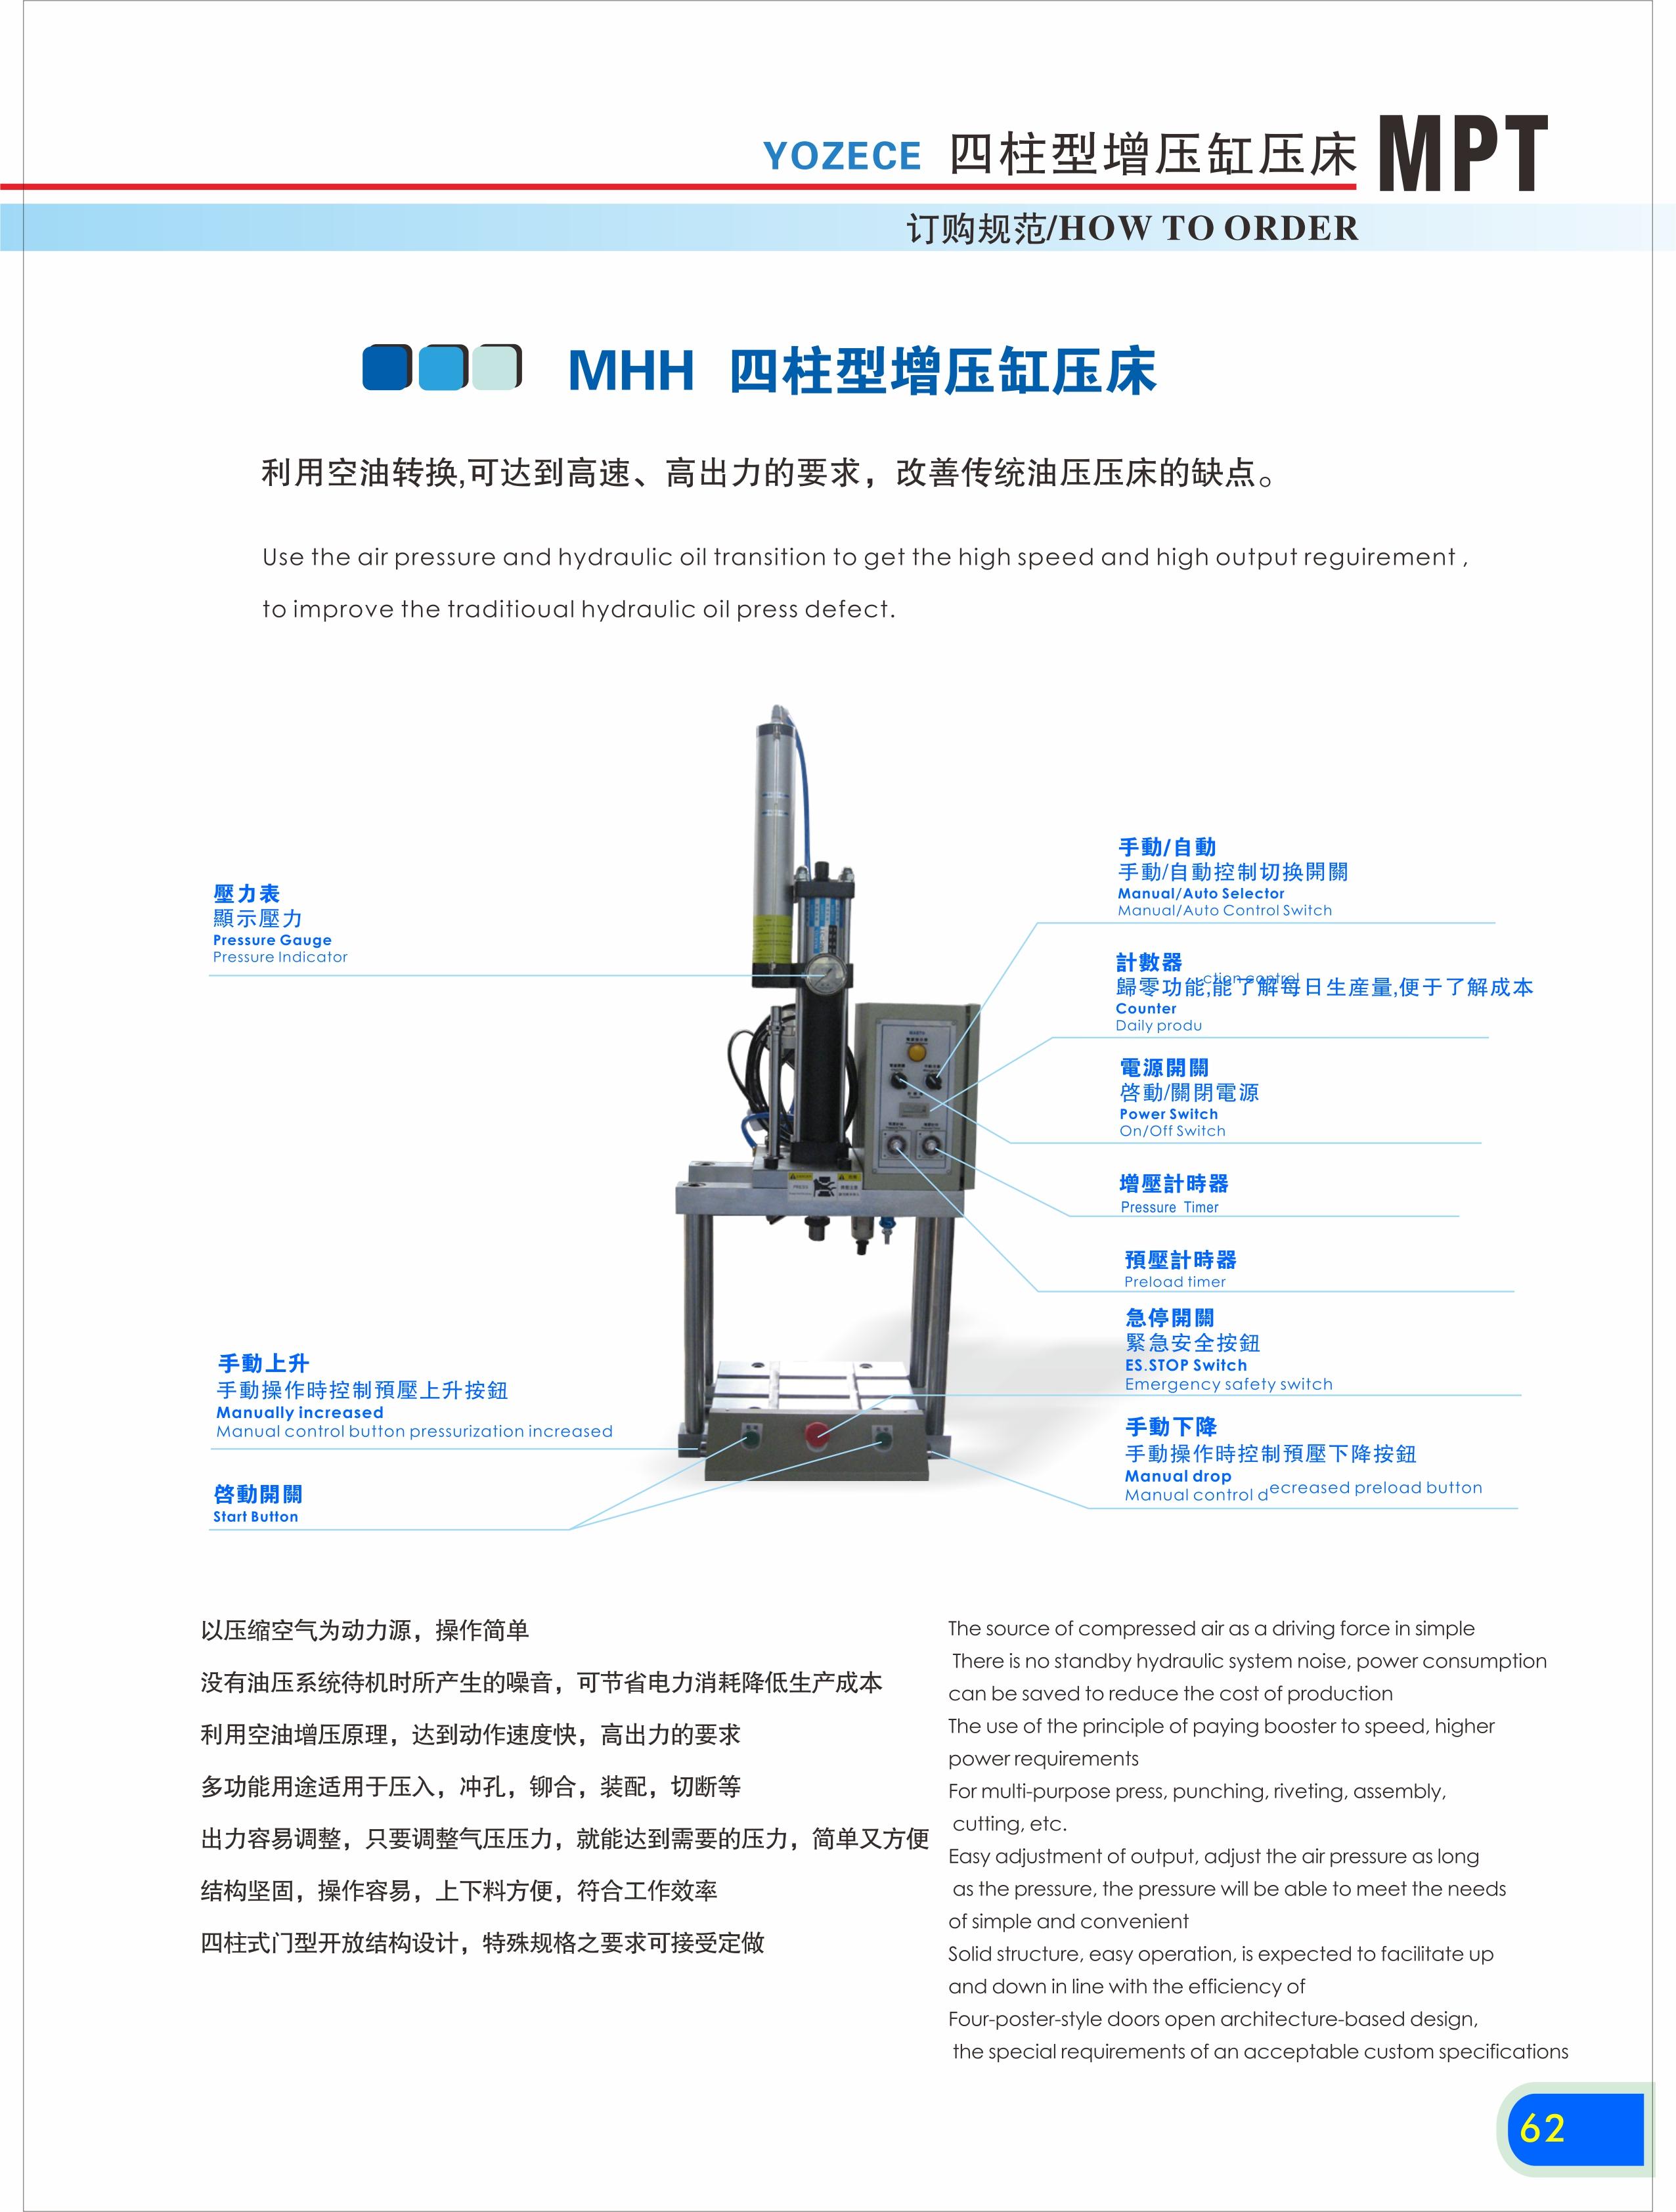 Four-column pressure cylinder press